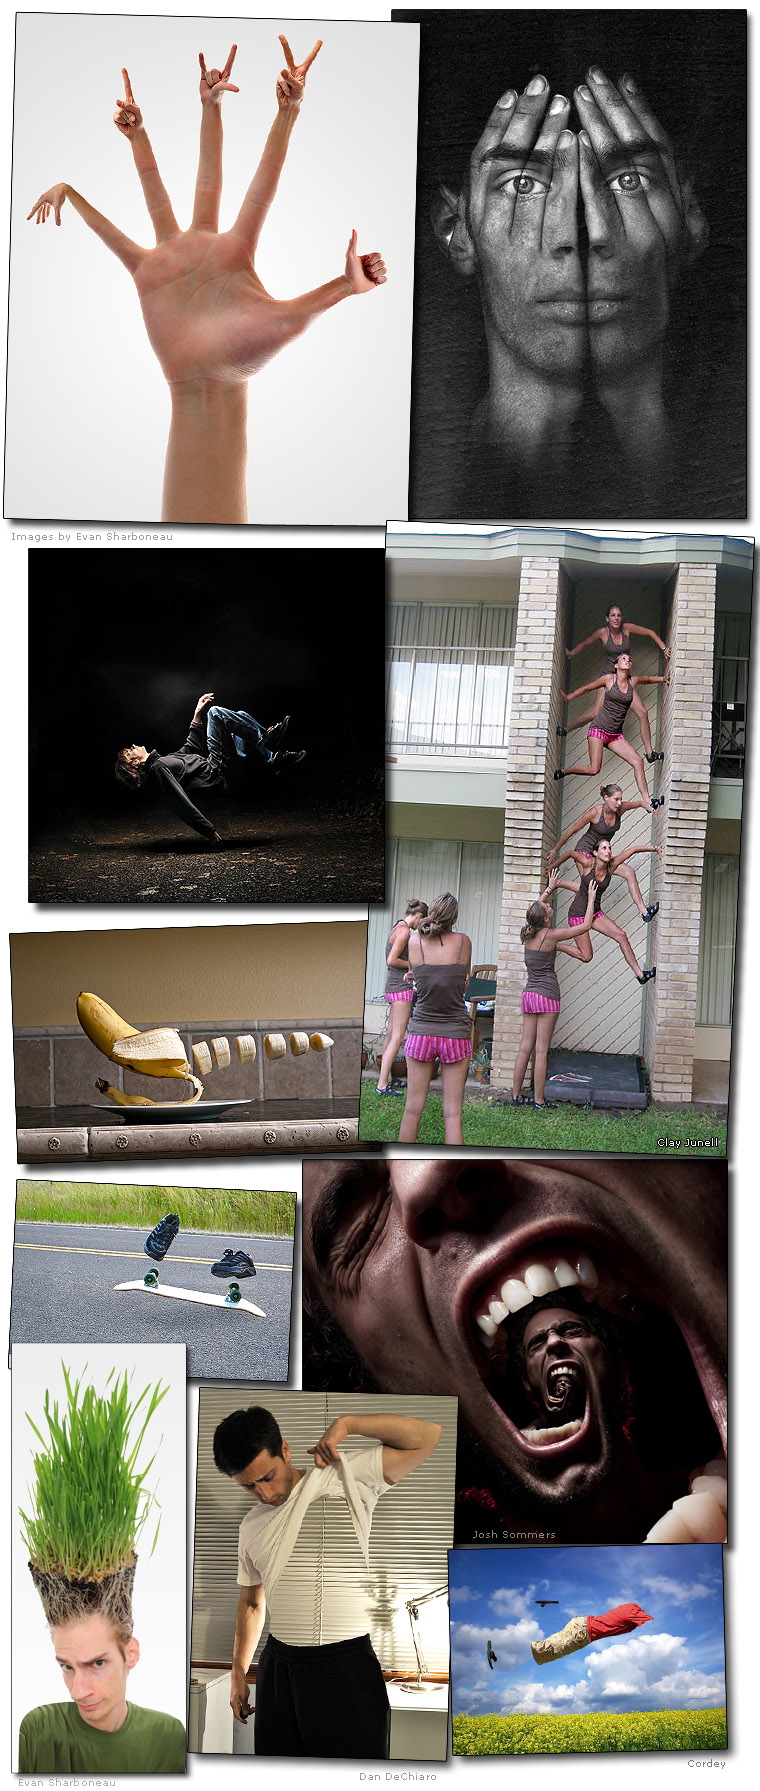 Adobe Photoshop Photomanipulations